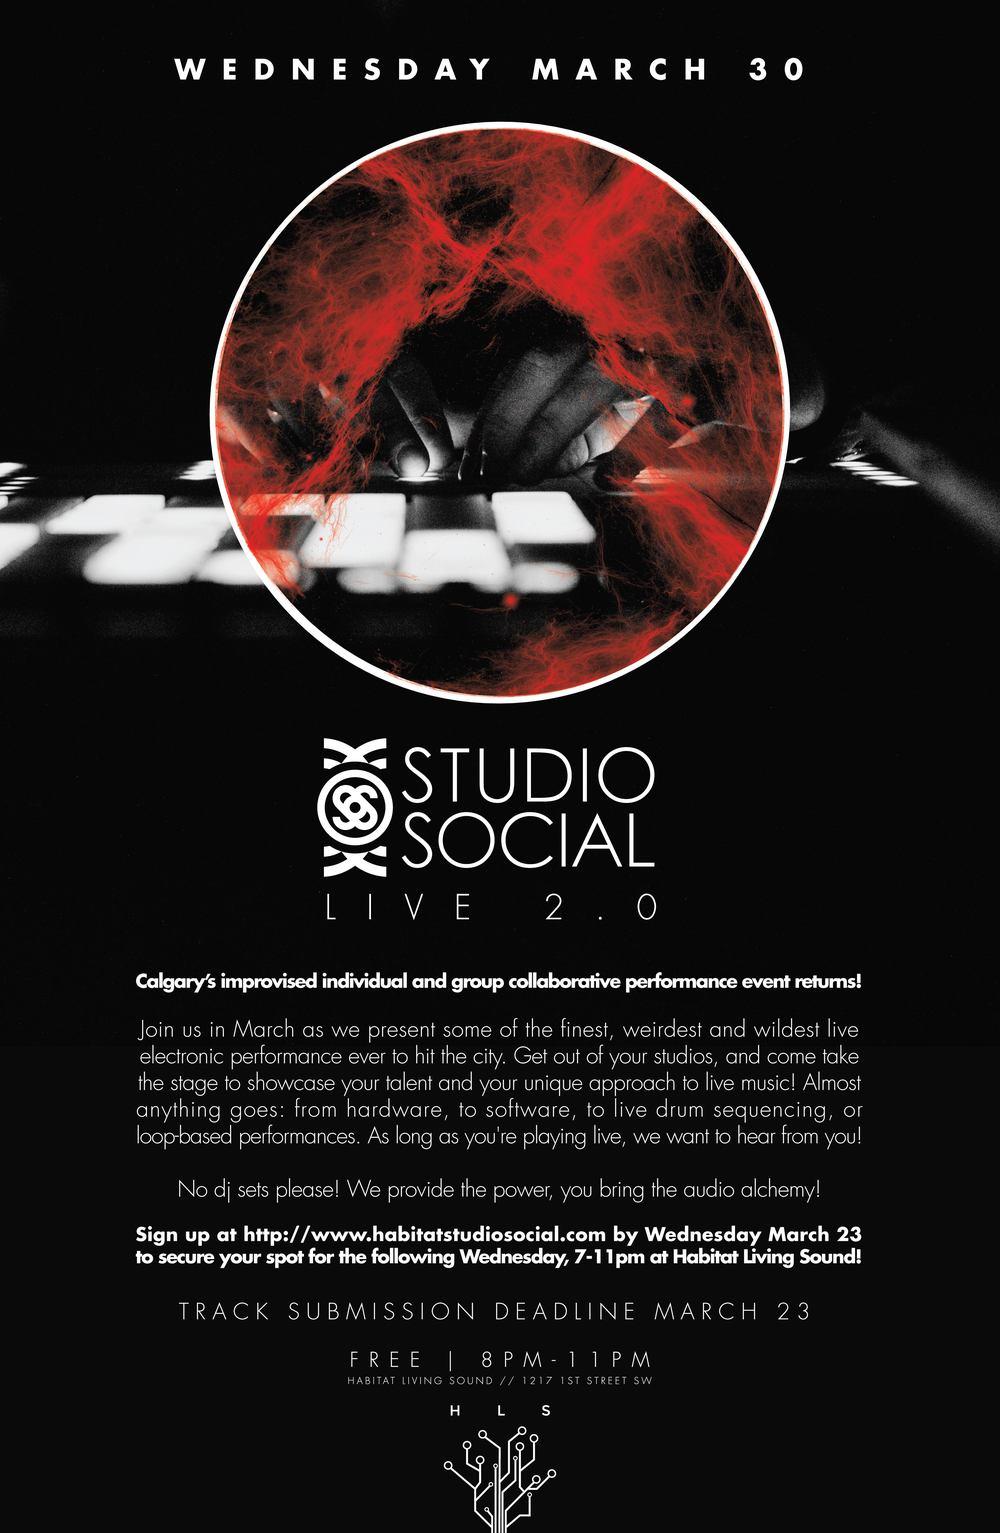 habitat-Studio-social-live-2.jpeg